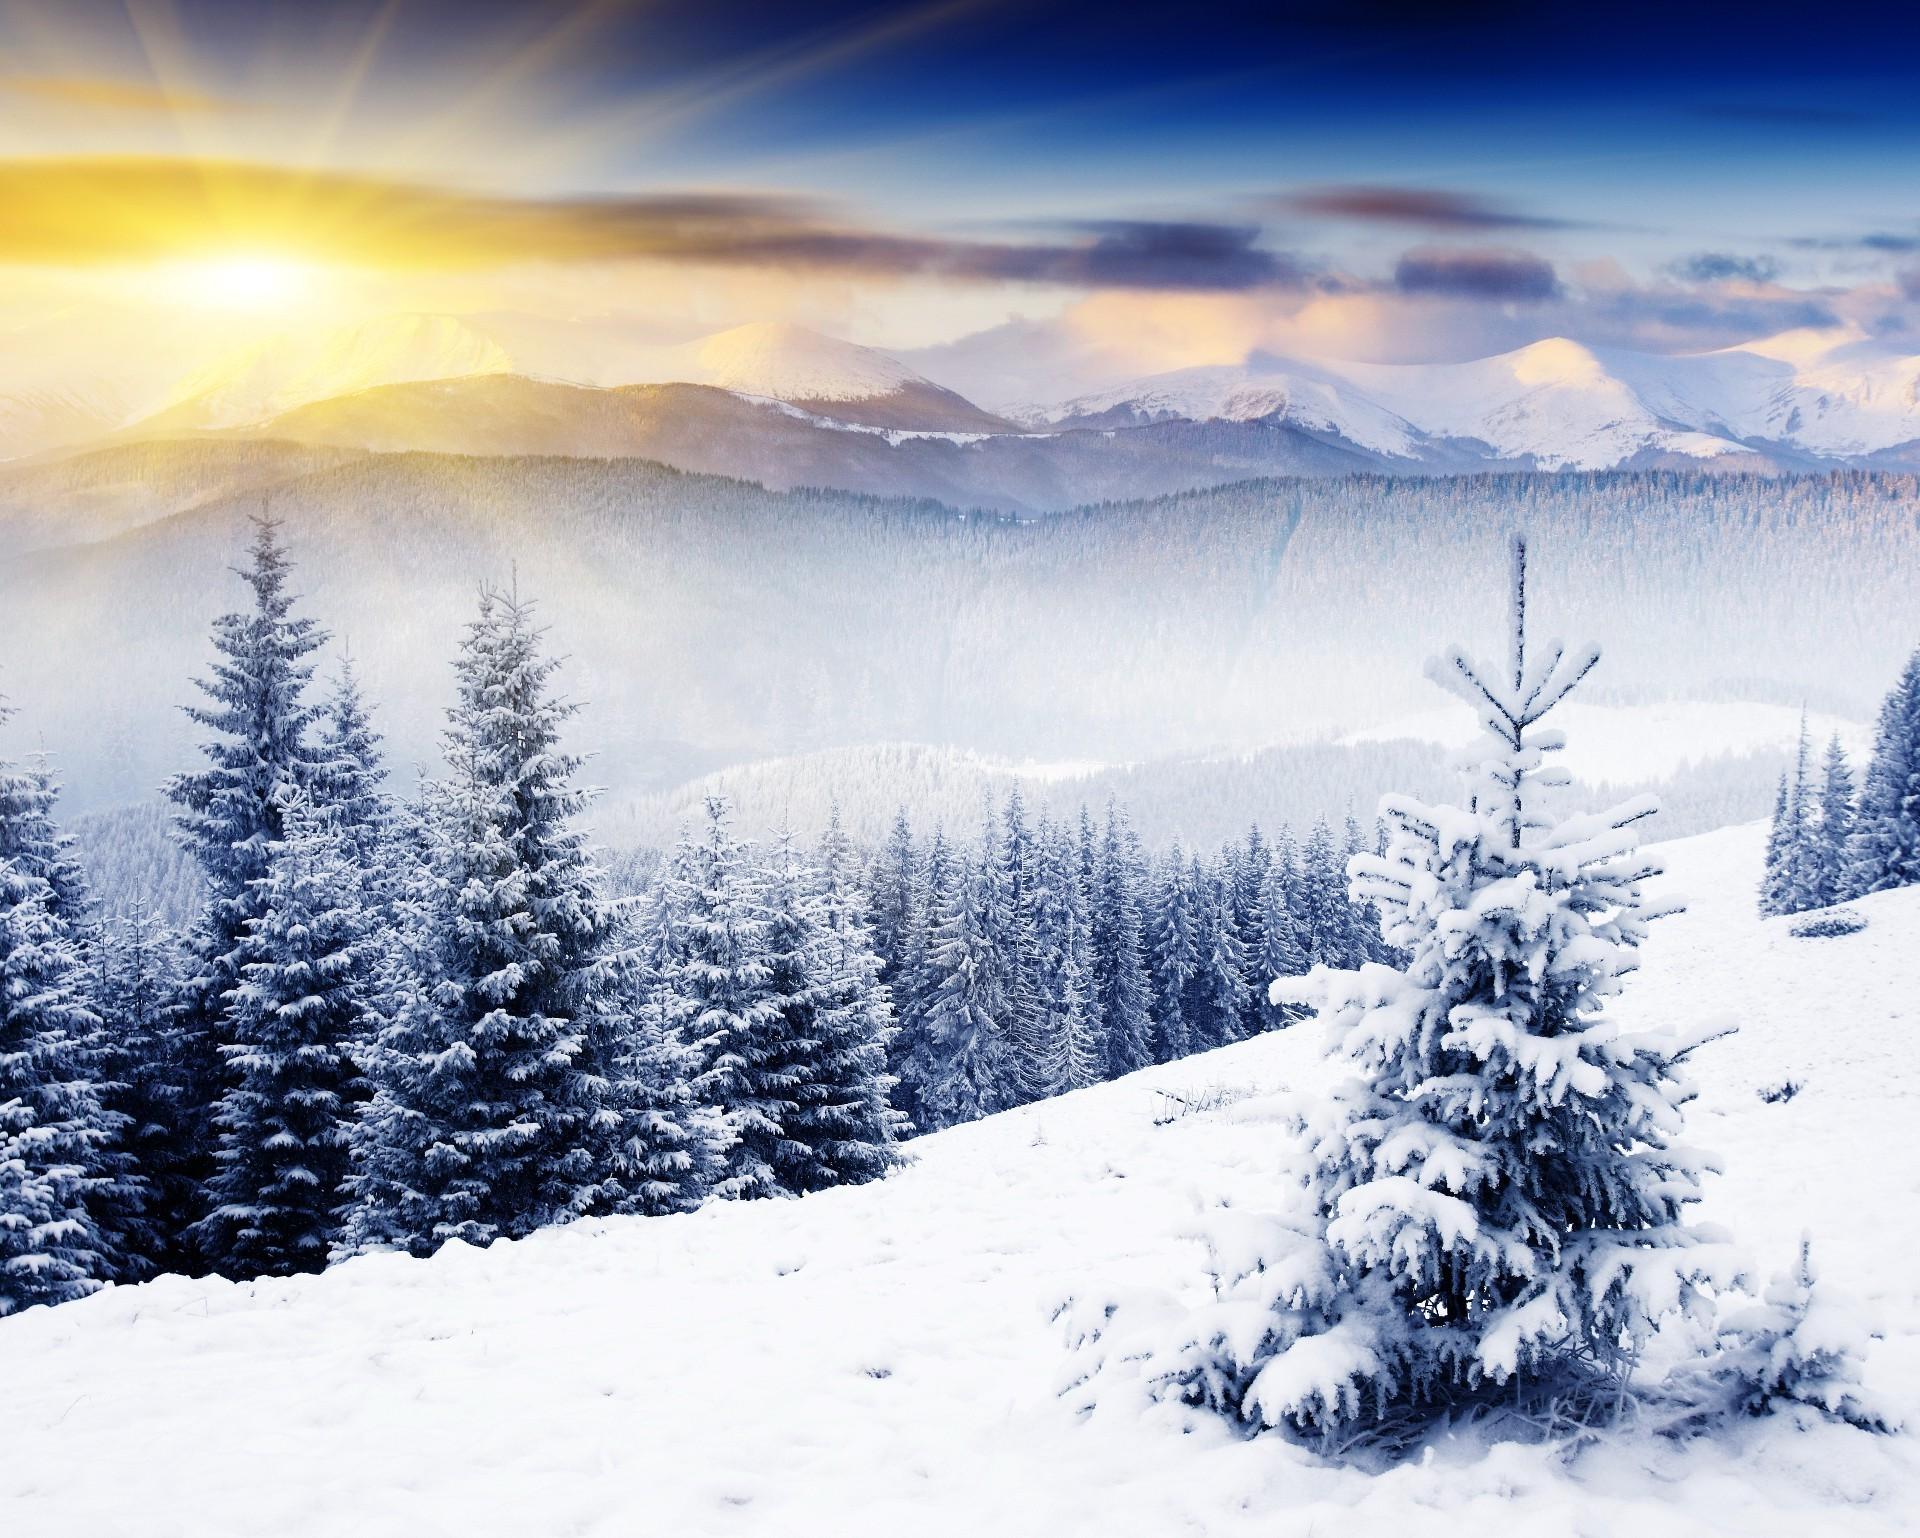 Cool Wallpaper Mountain Christmas - 9842330827880838779  2018_257659.jpg